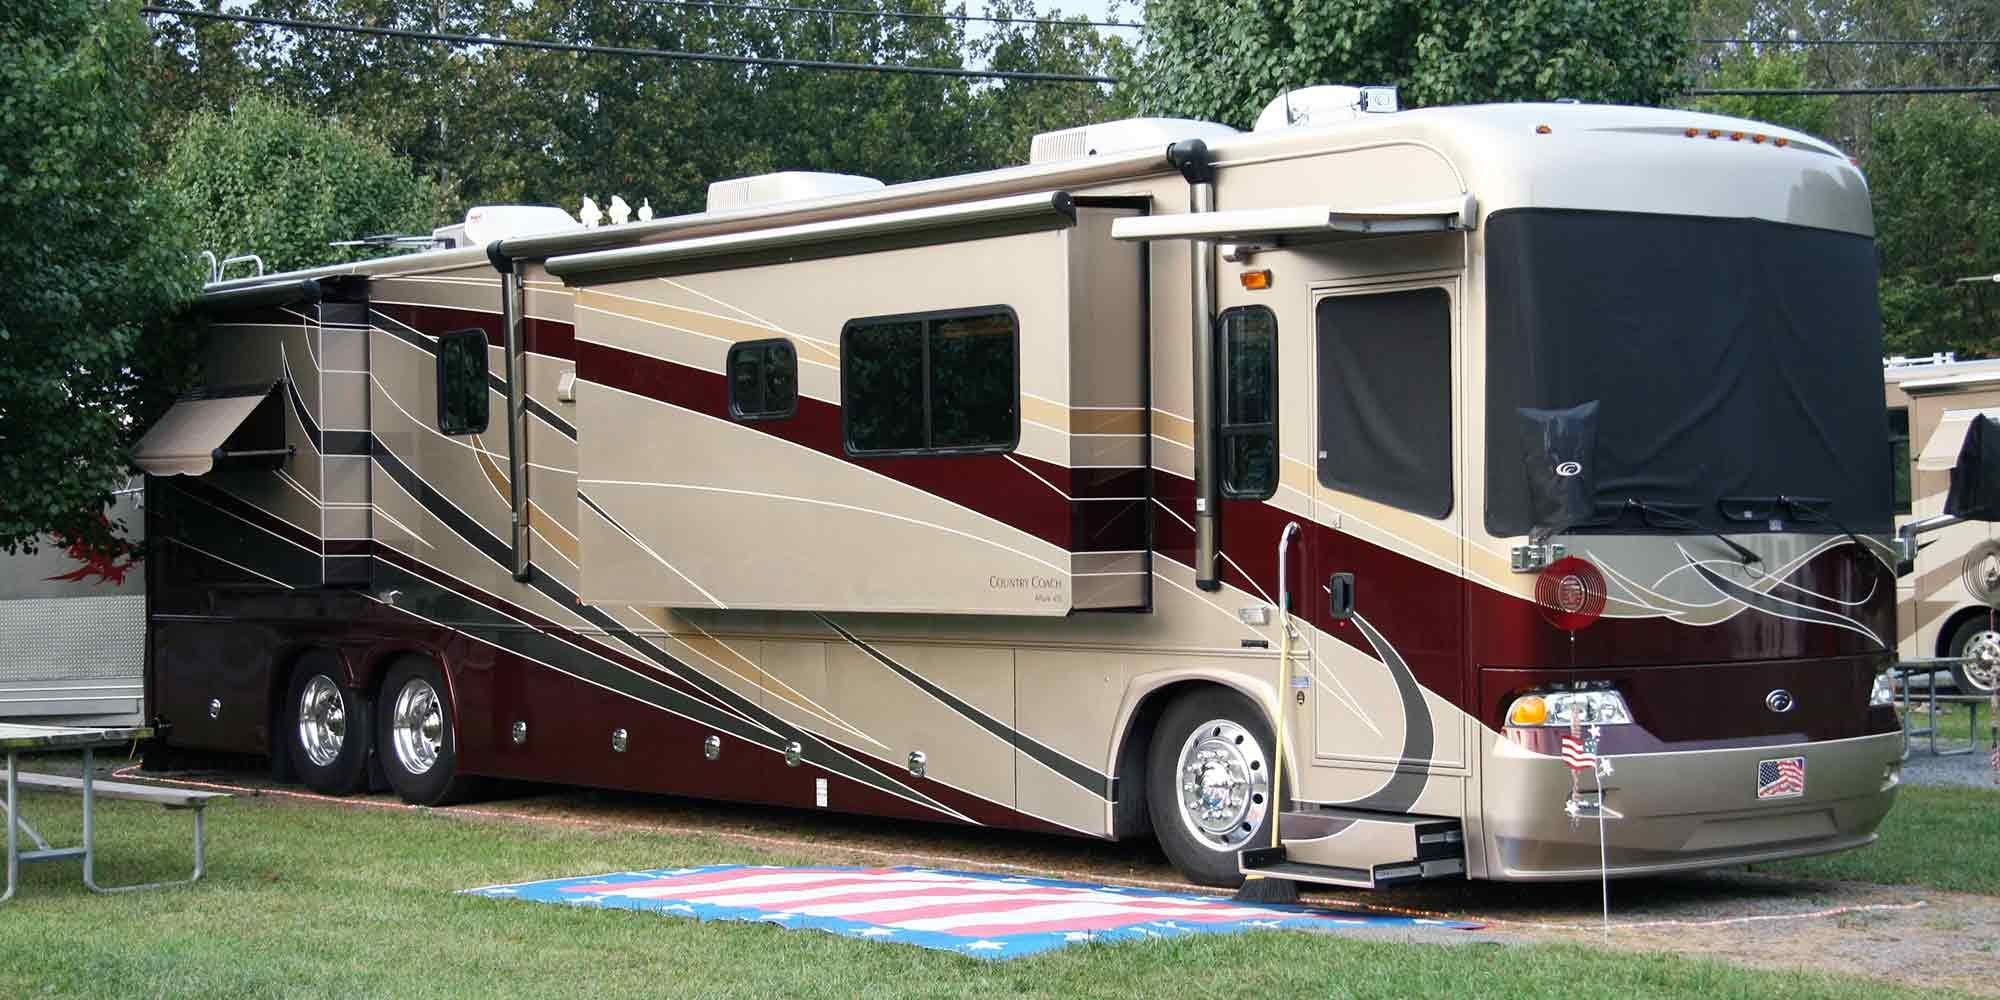 RV Camping - Seneca Rocks, WV Cabin Rentals | Smoke Hole Resort